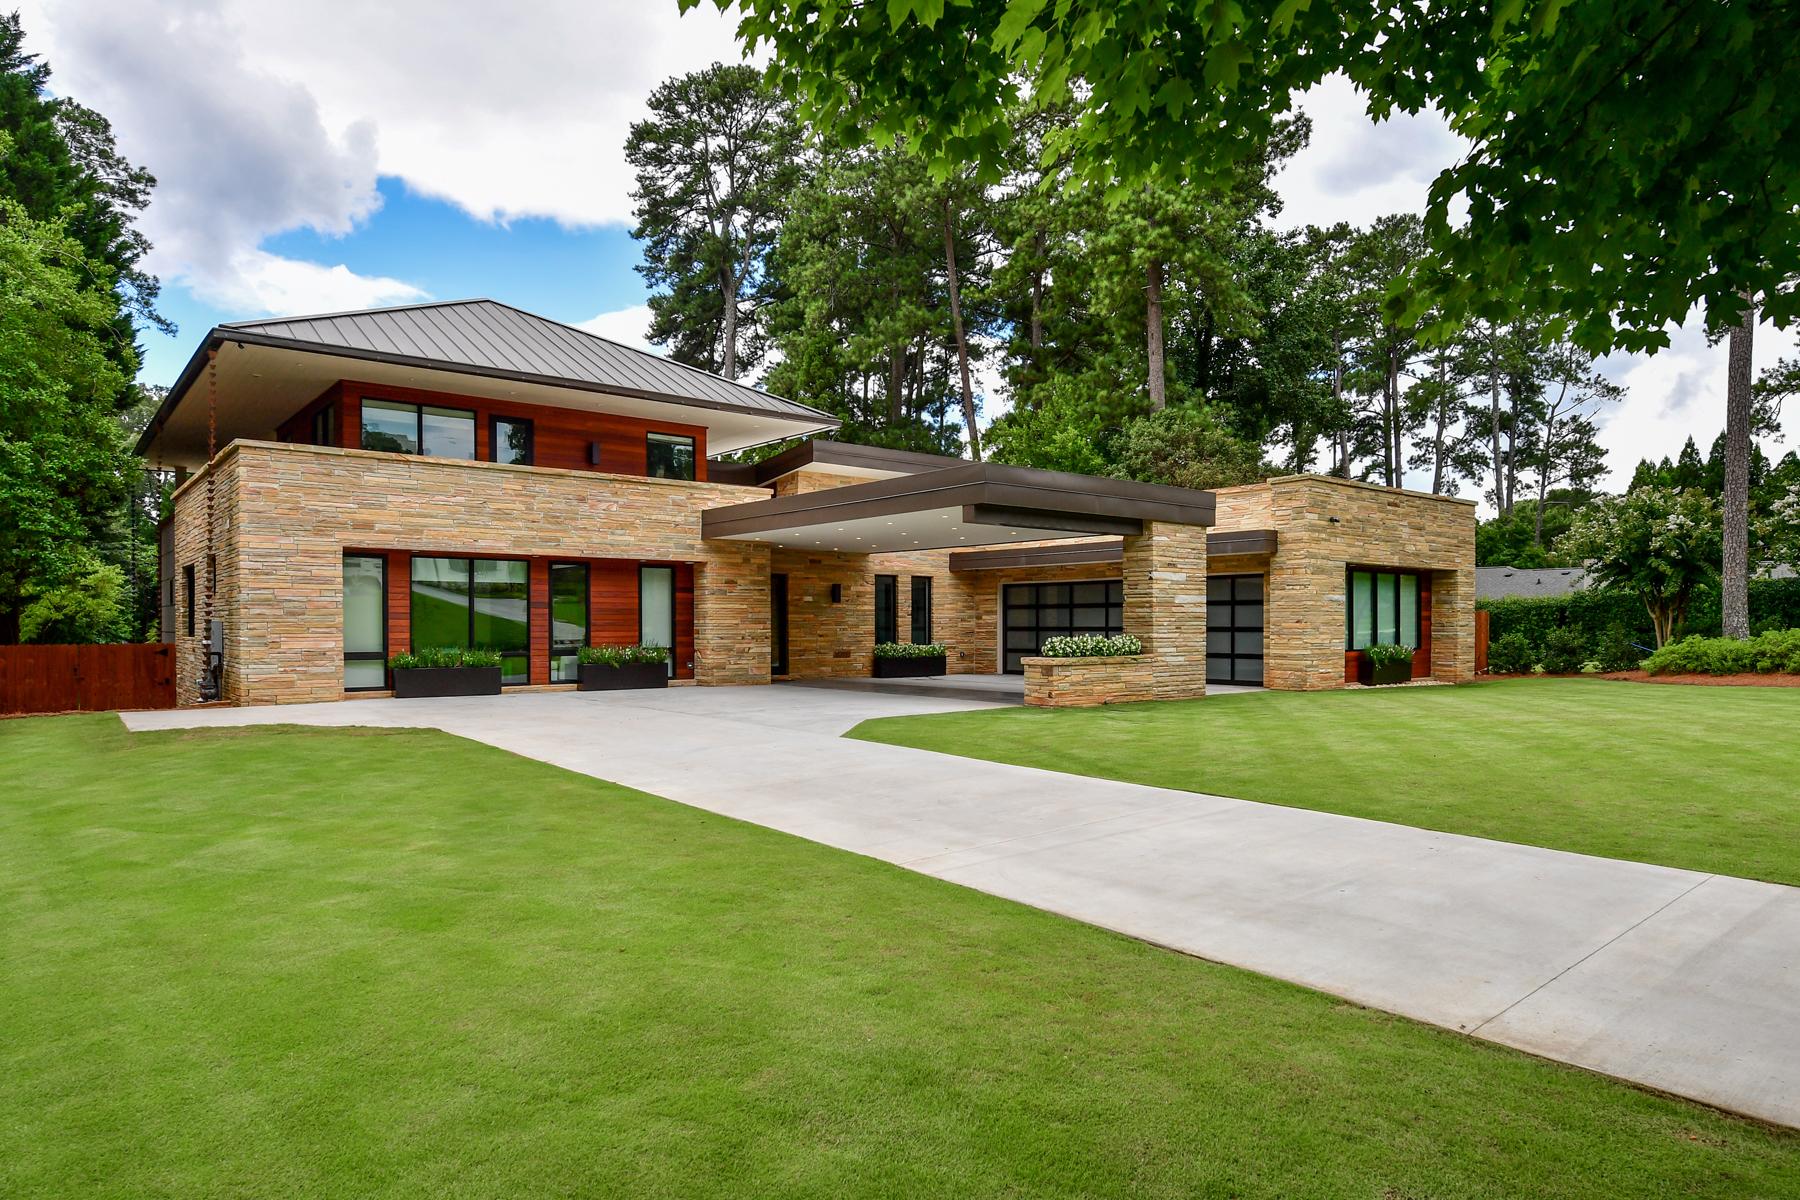 Single Family Home for Sale at Custom Contemporary Home in Buckhead 440 Cochran Drive Atlanta, Georgia 30327 United States